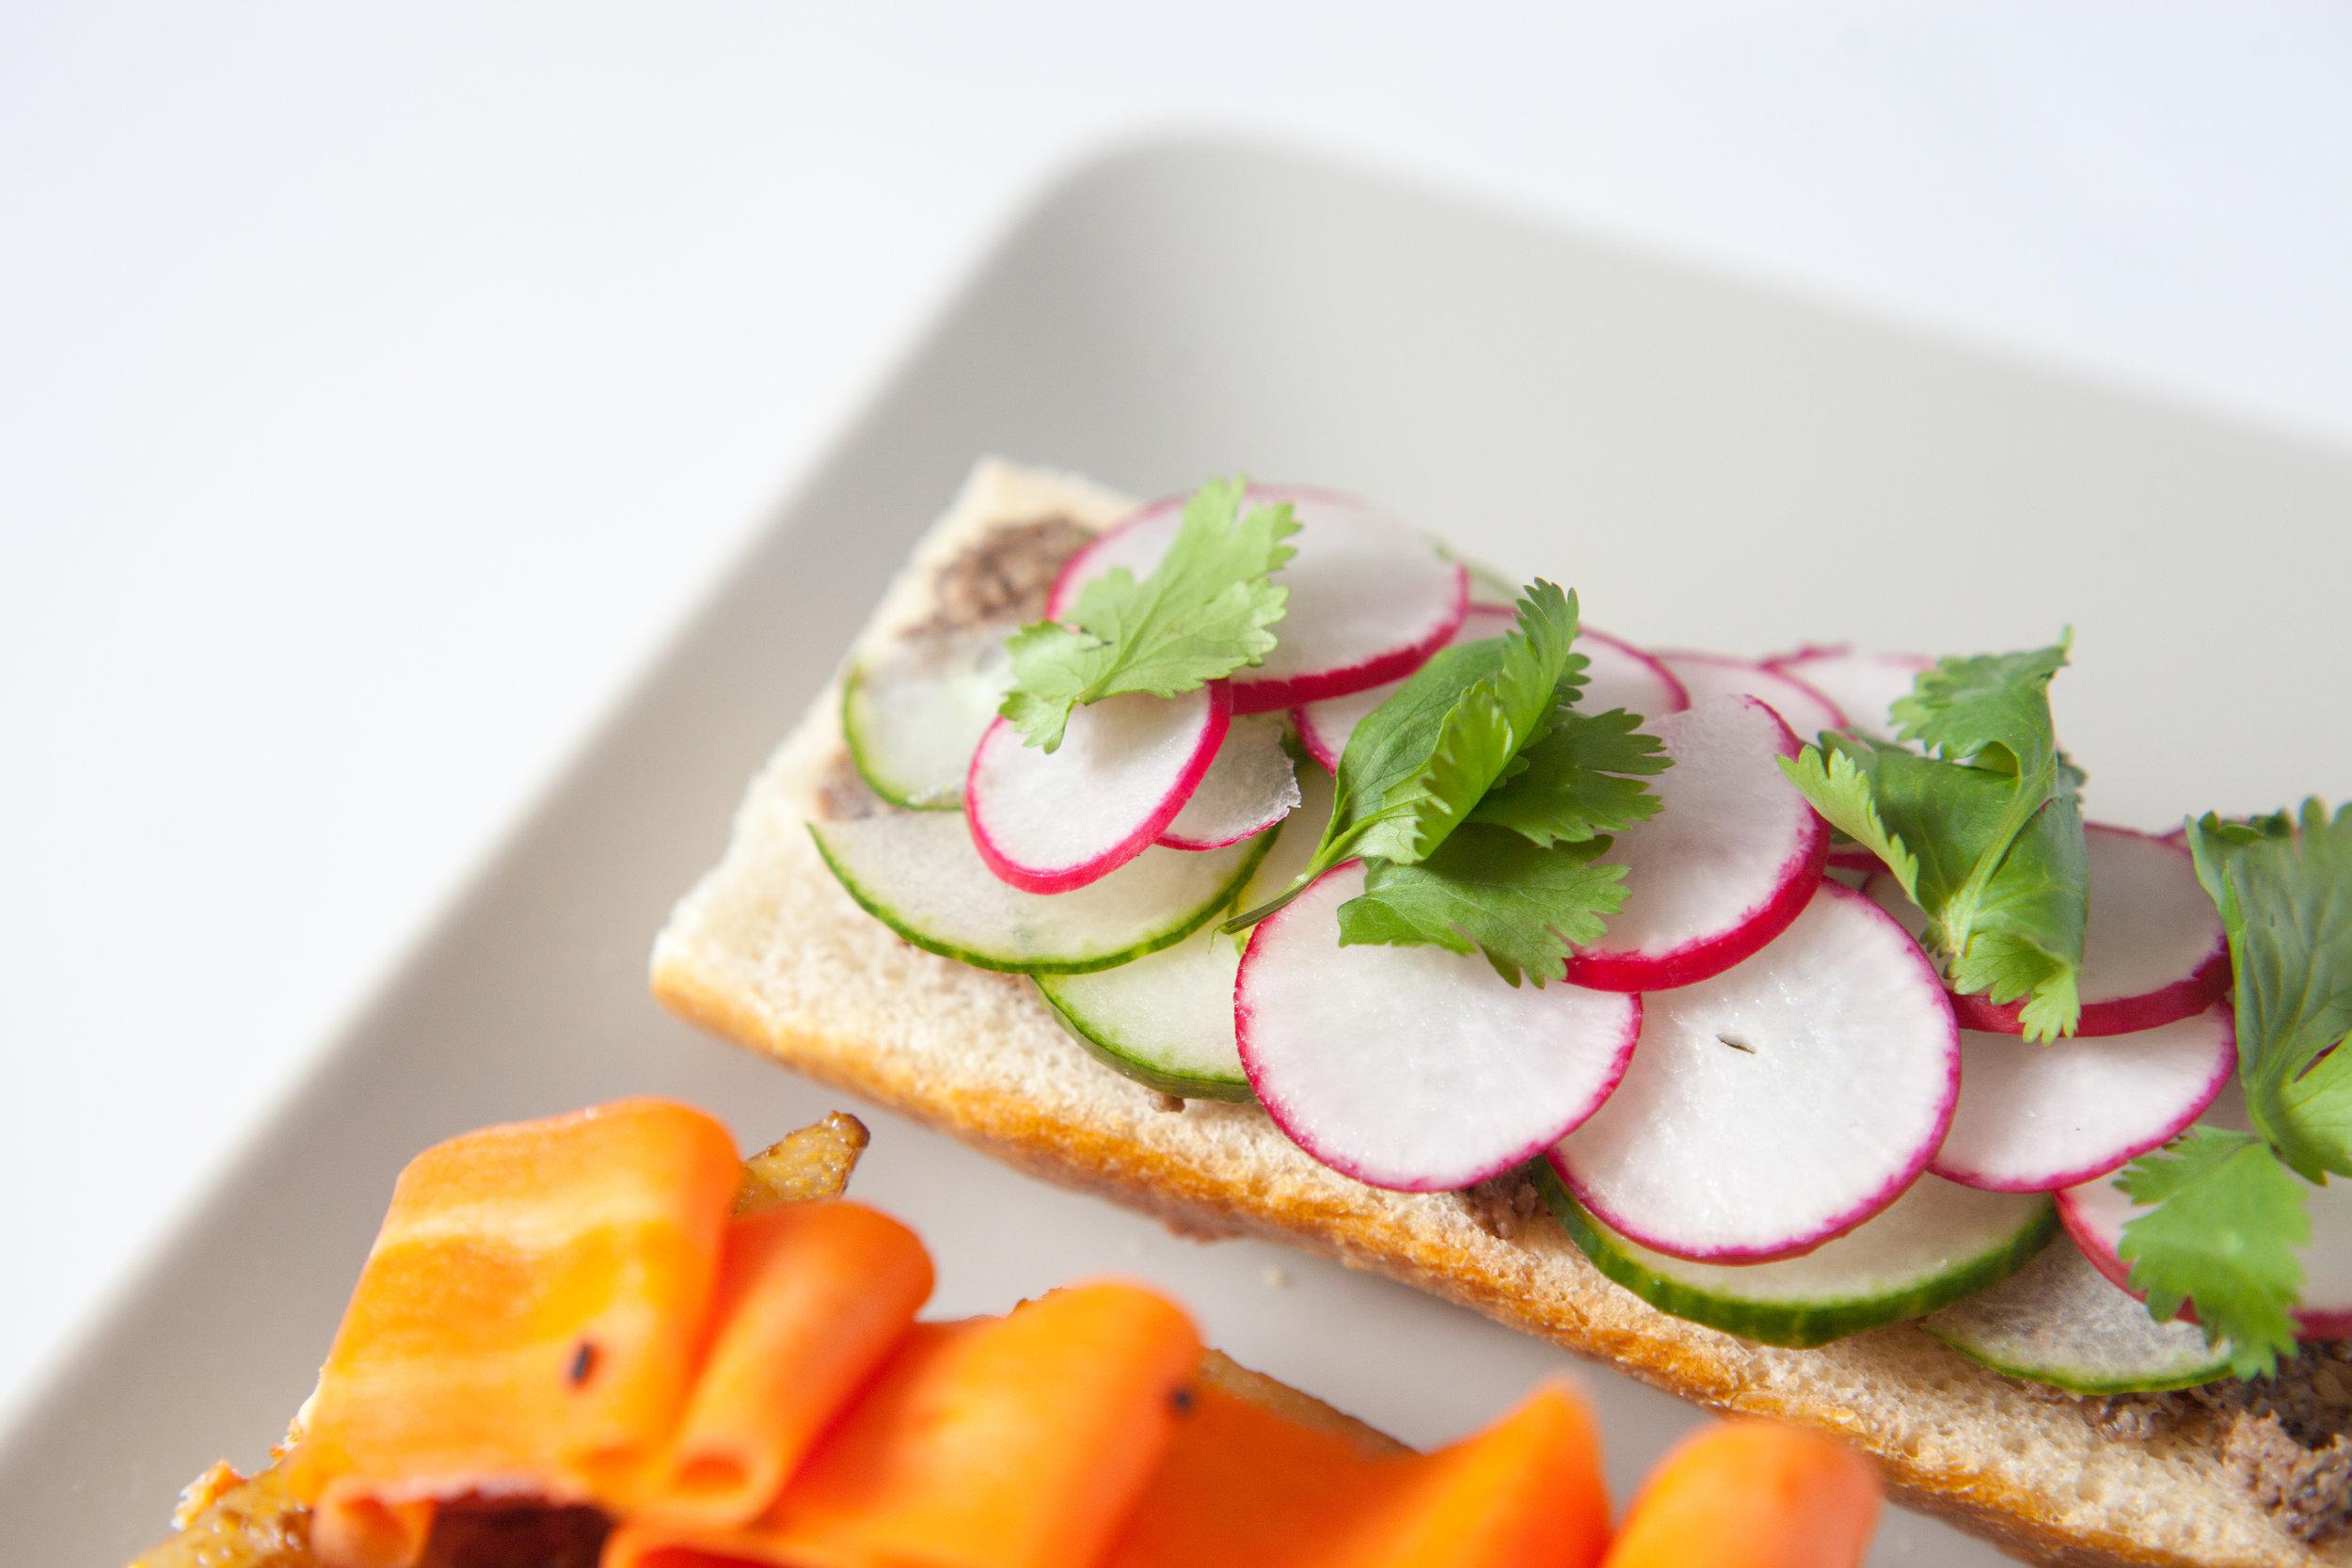 Vegetable Polenta Bahn Mi Sandwich